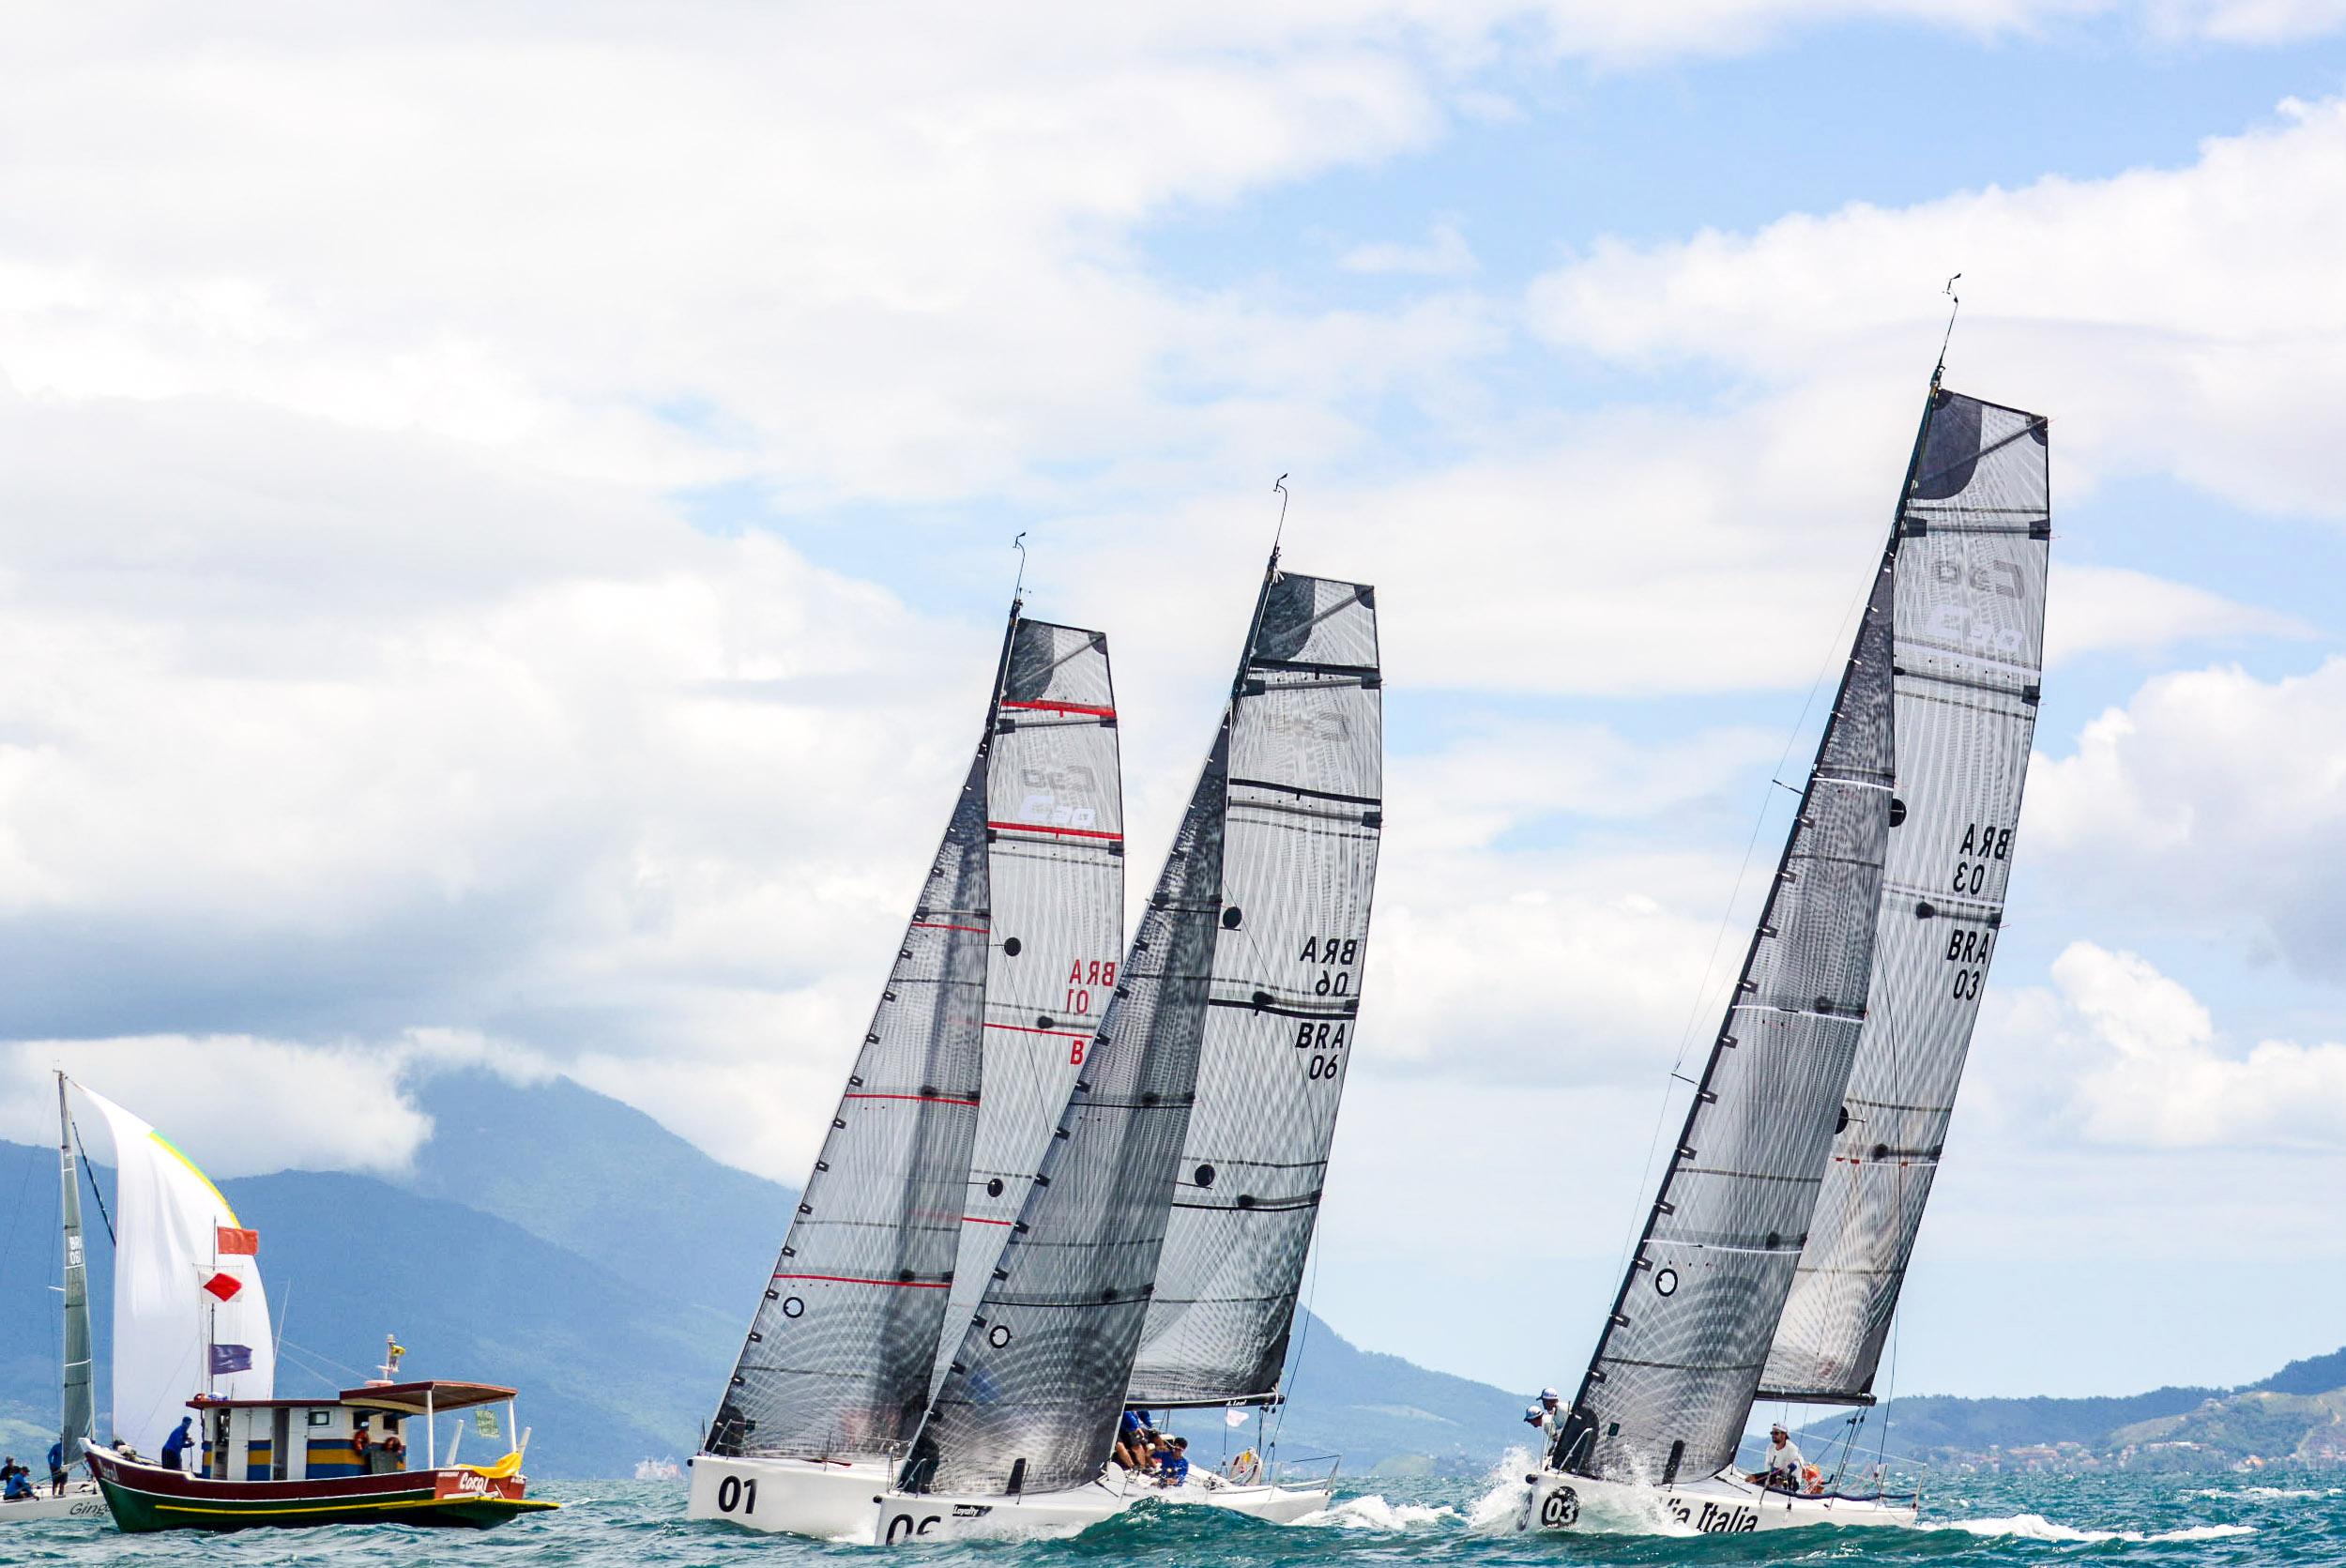 Largada Classe C30 Crédito Aline Bassi:Balaio - boat shopping